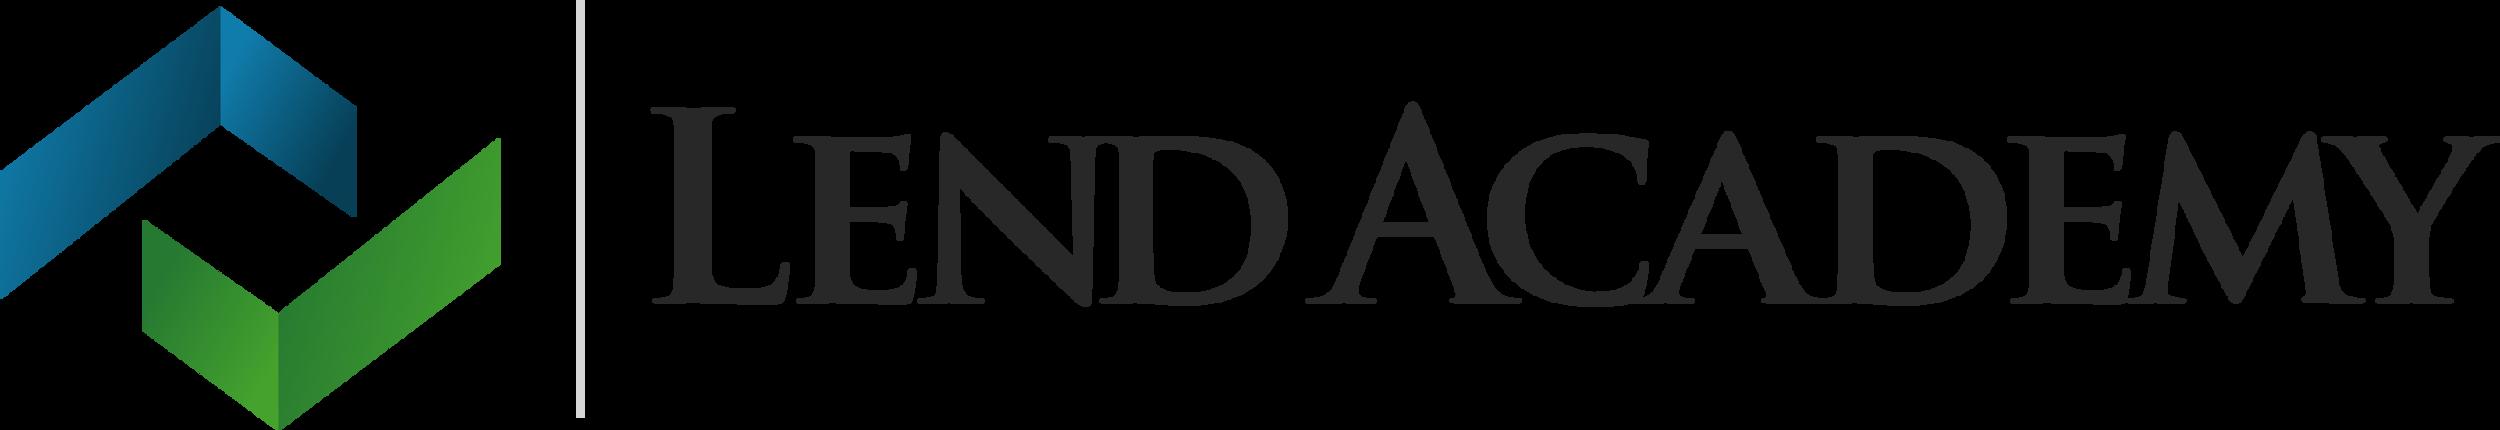 LendAcademy1.png